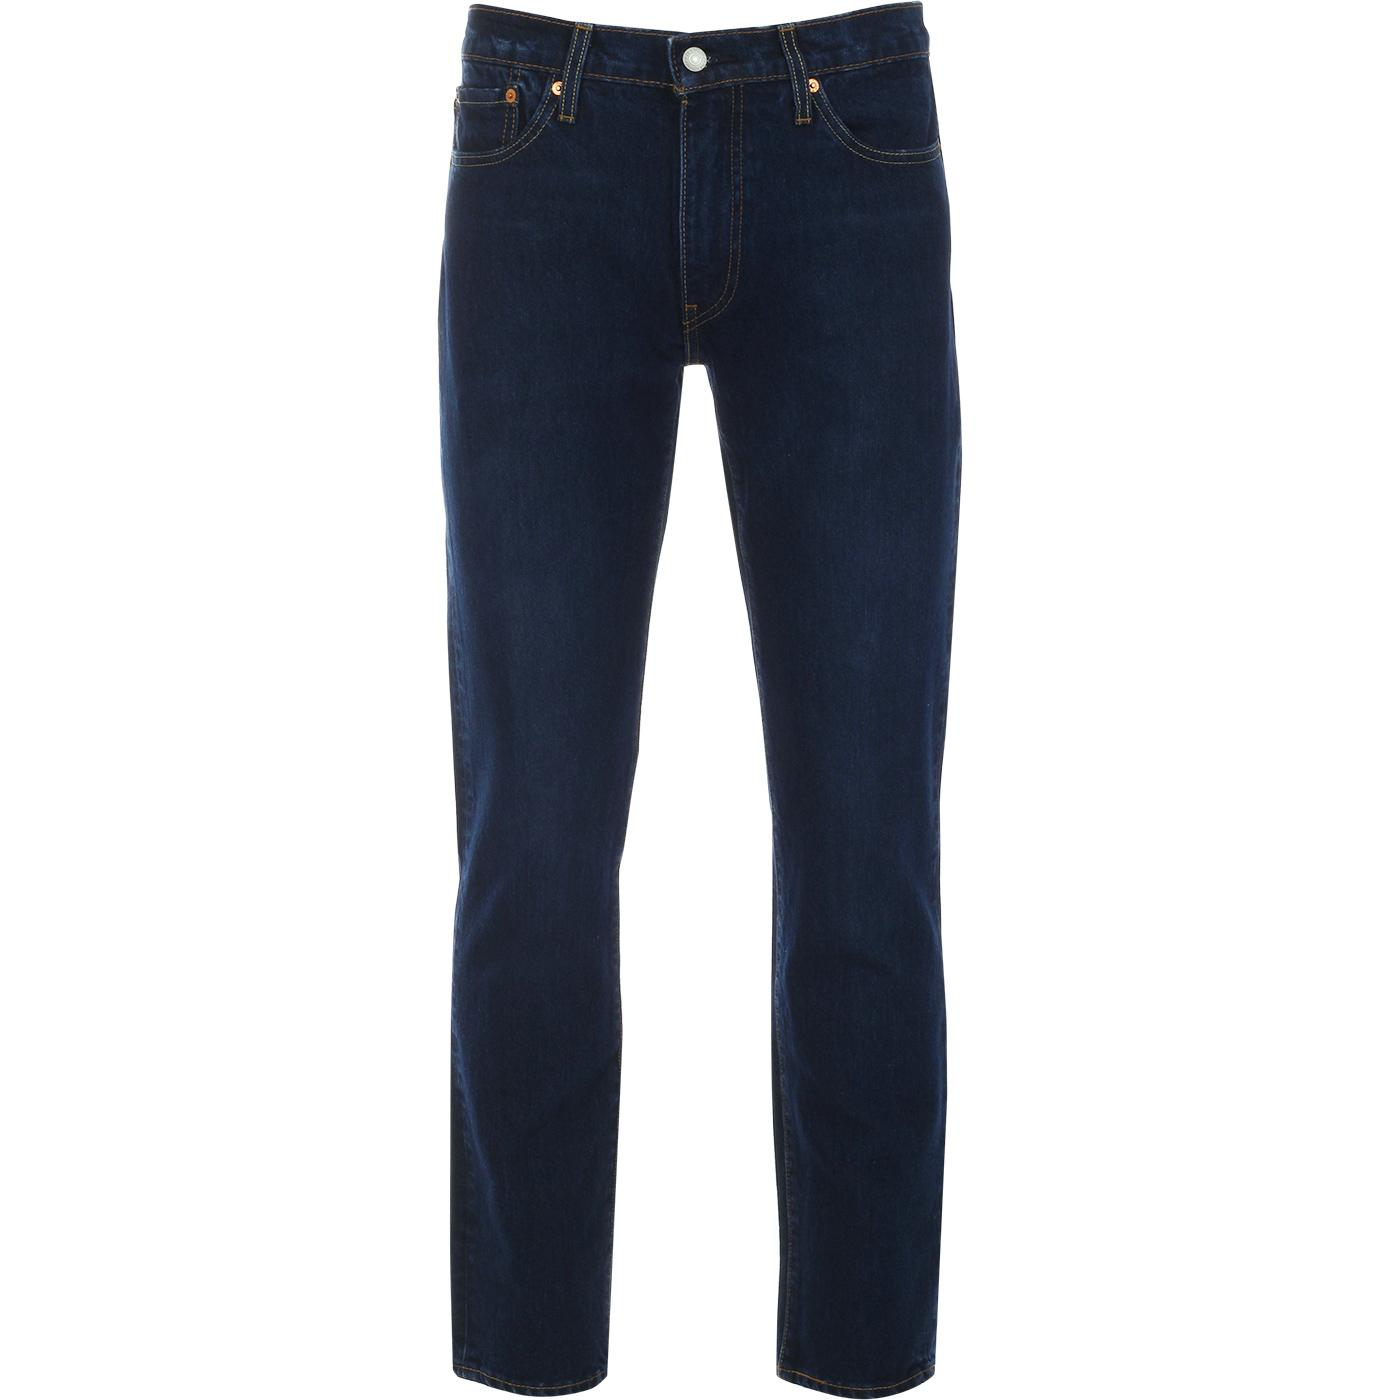 LEVI'S 511 Slim Thermadapt Jeans (Orange Sunset)